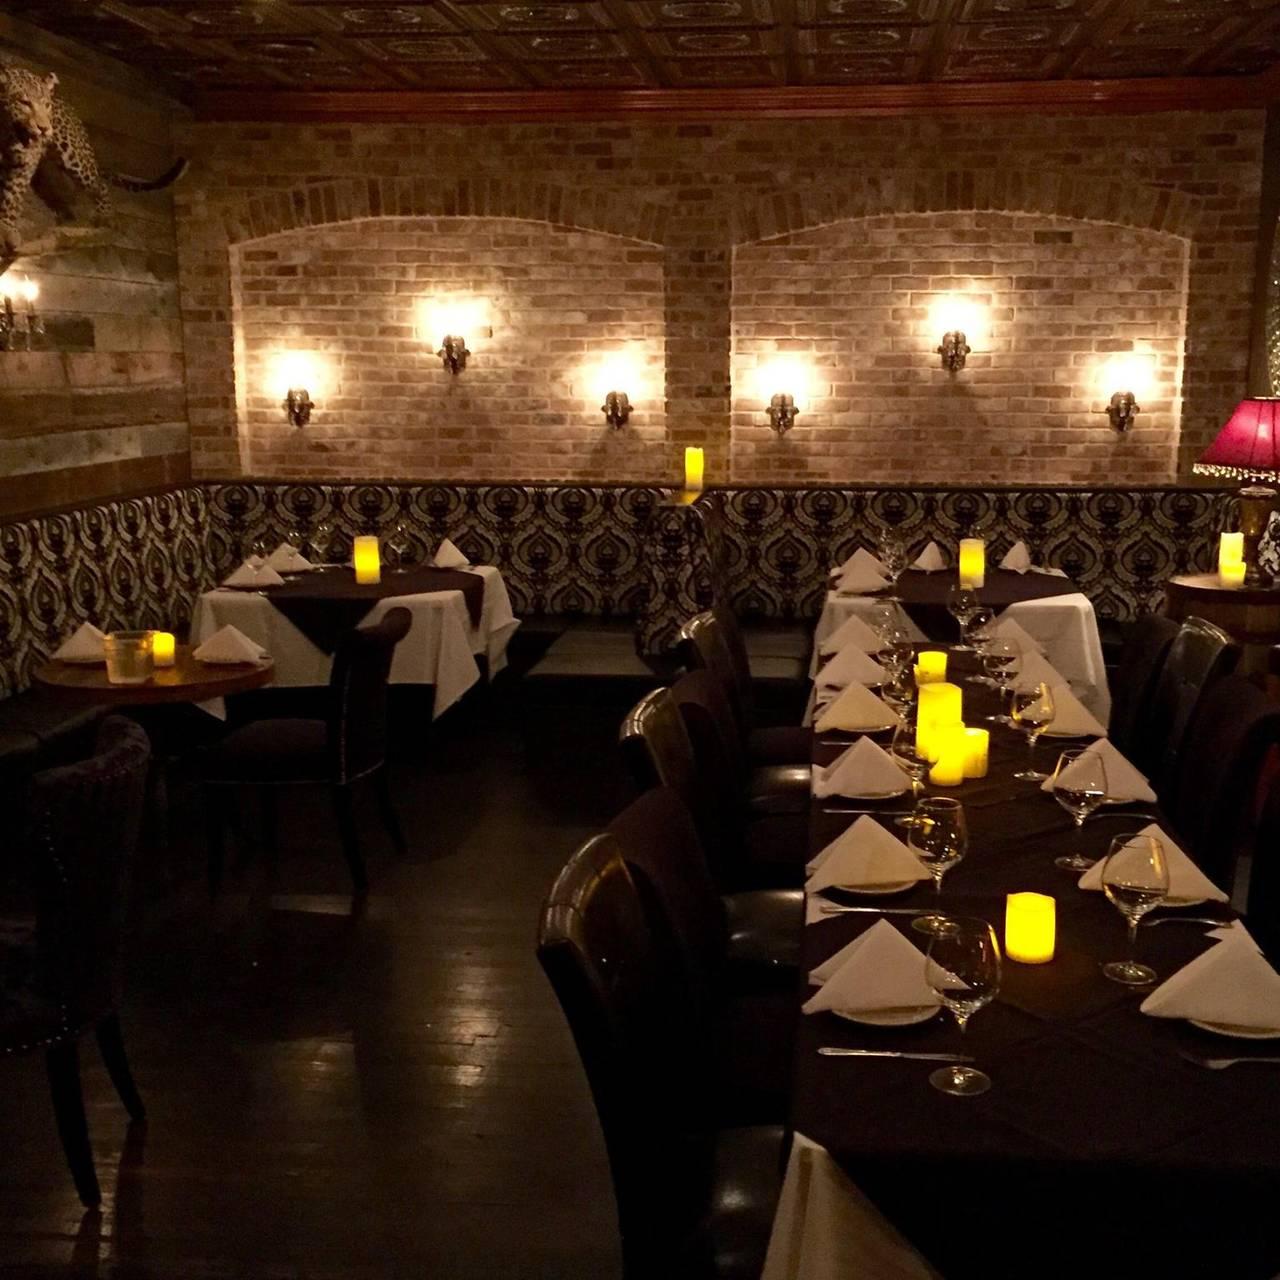 Grazia Italian Kitchen - Pearland Restaurant - Pearland, TX | OpenTable